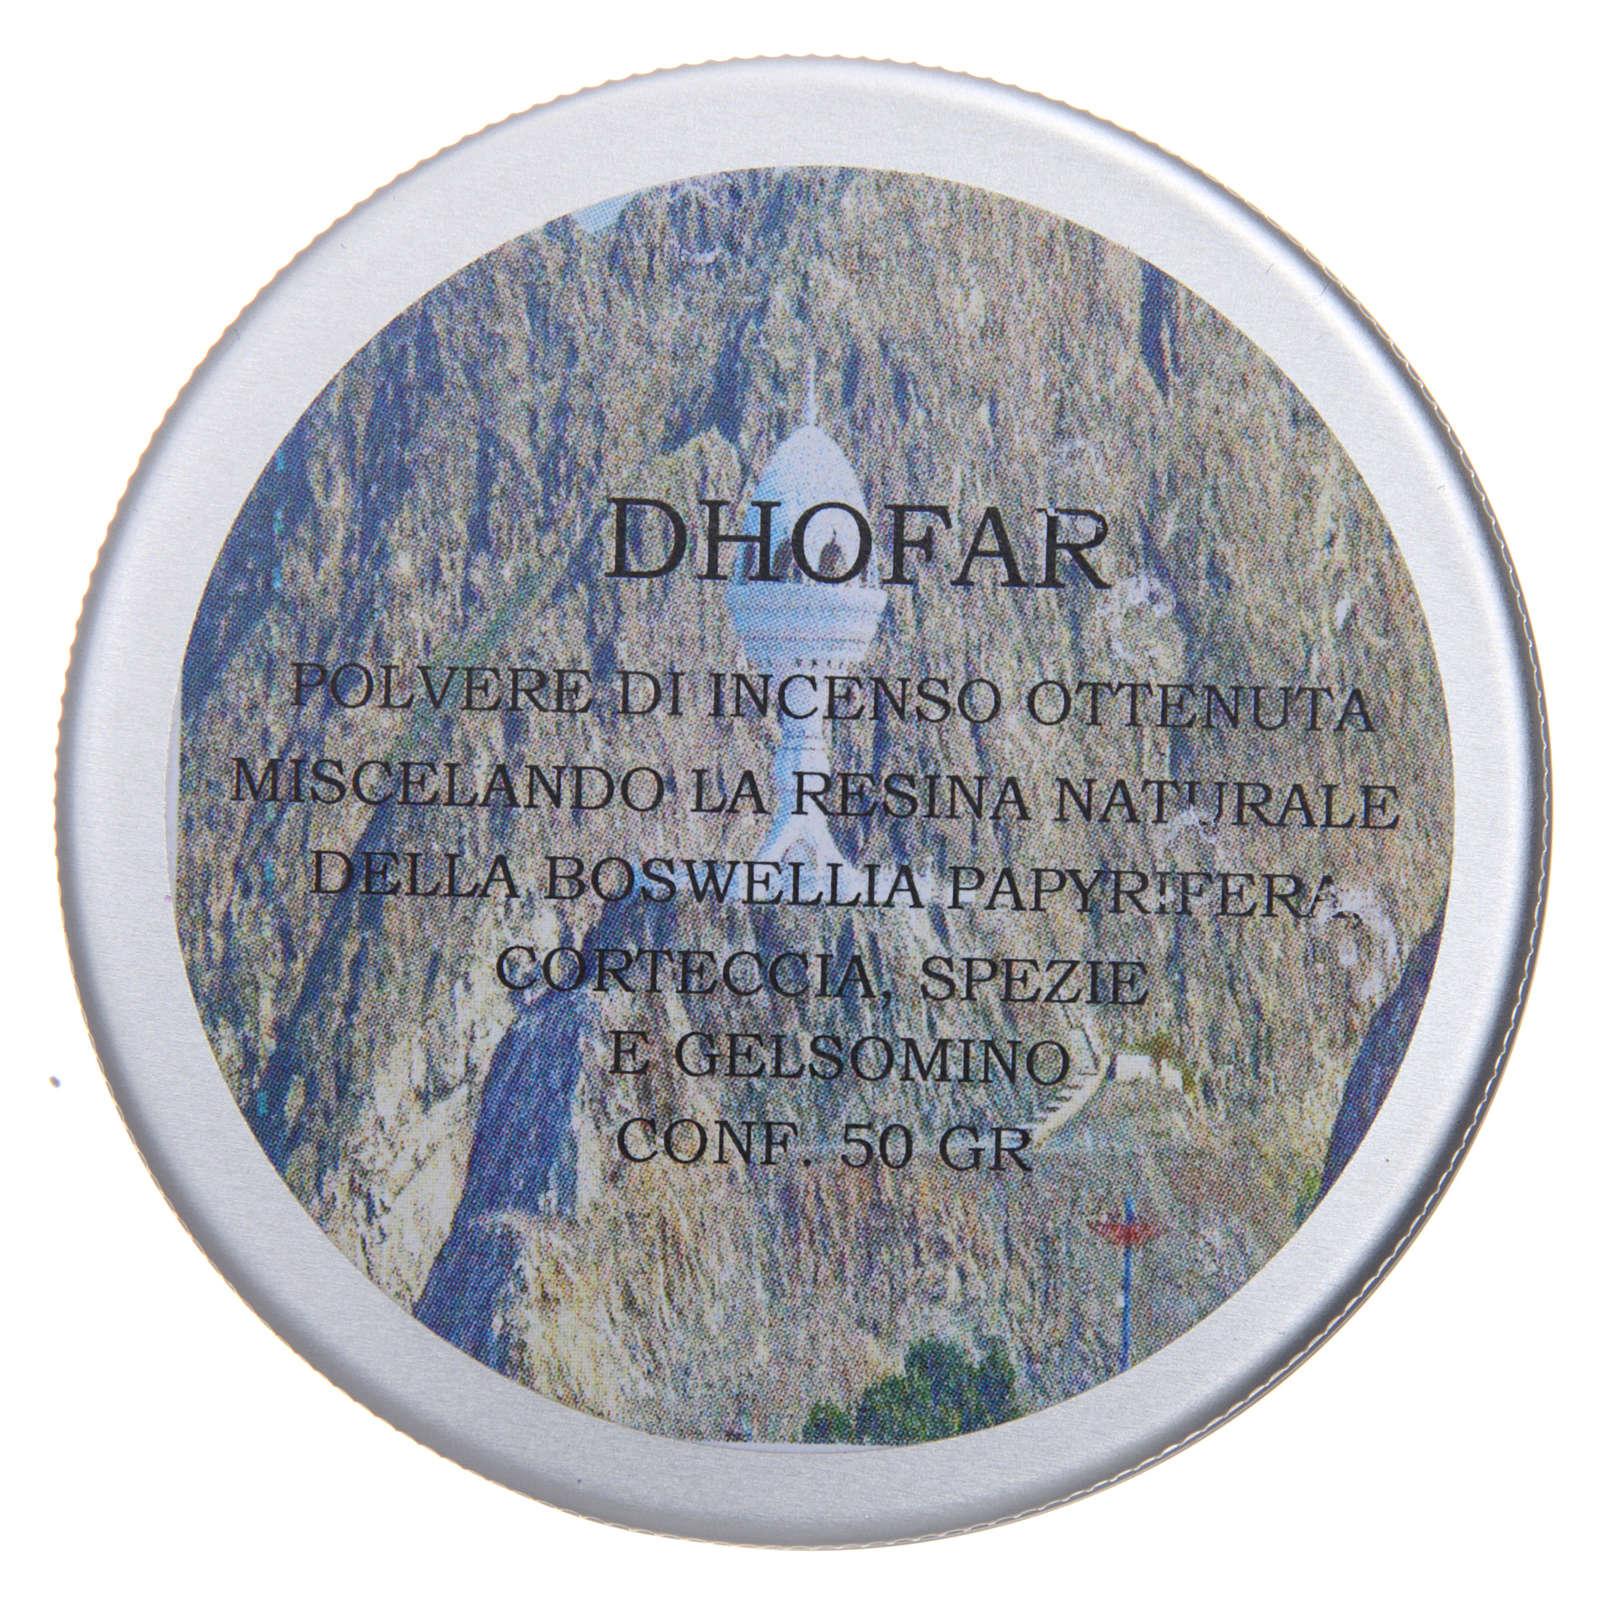 Incenso in polvere Dhofar 50 gr 3